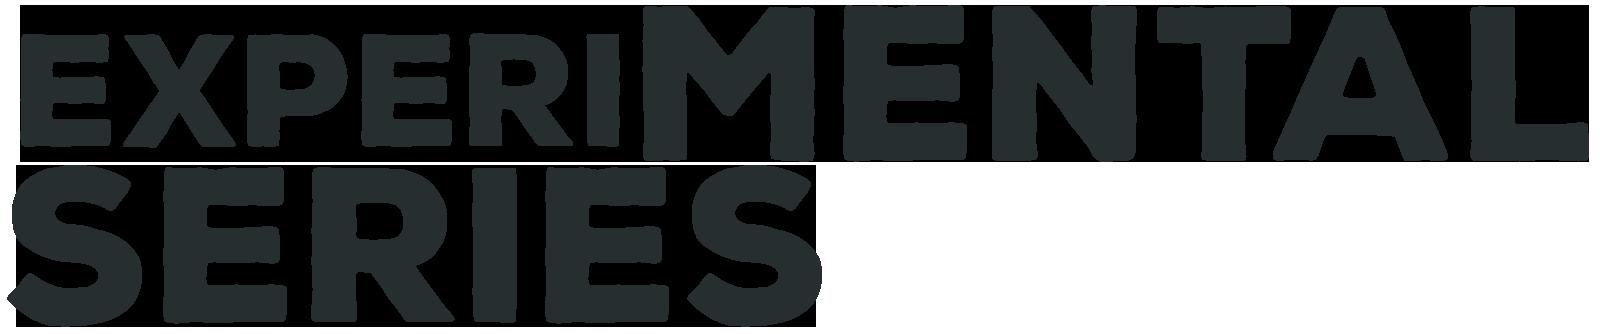 experimental-series-logo